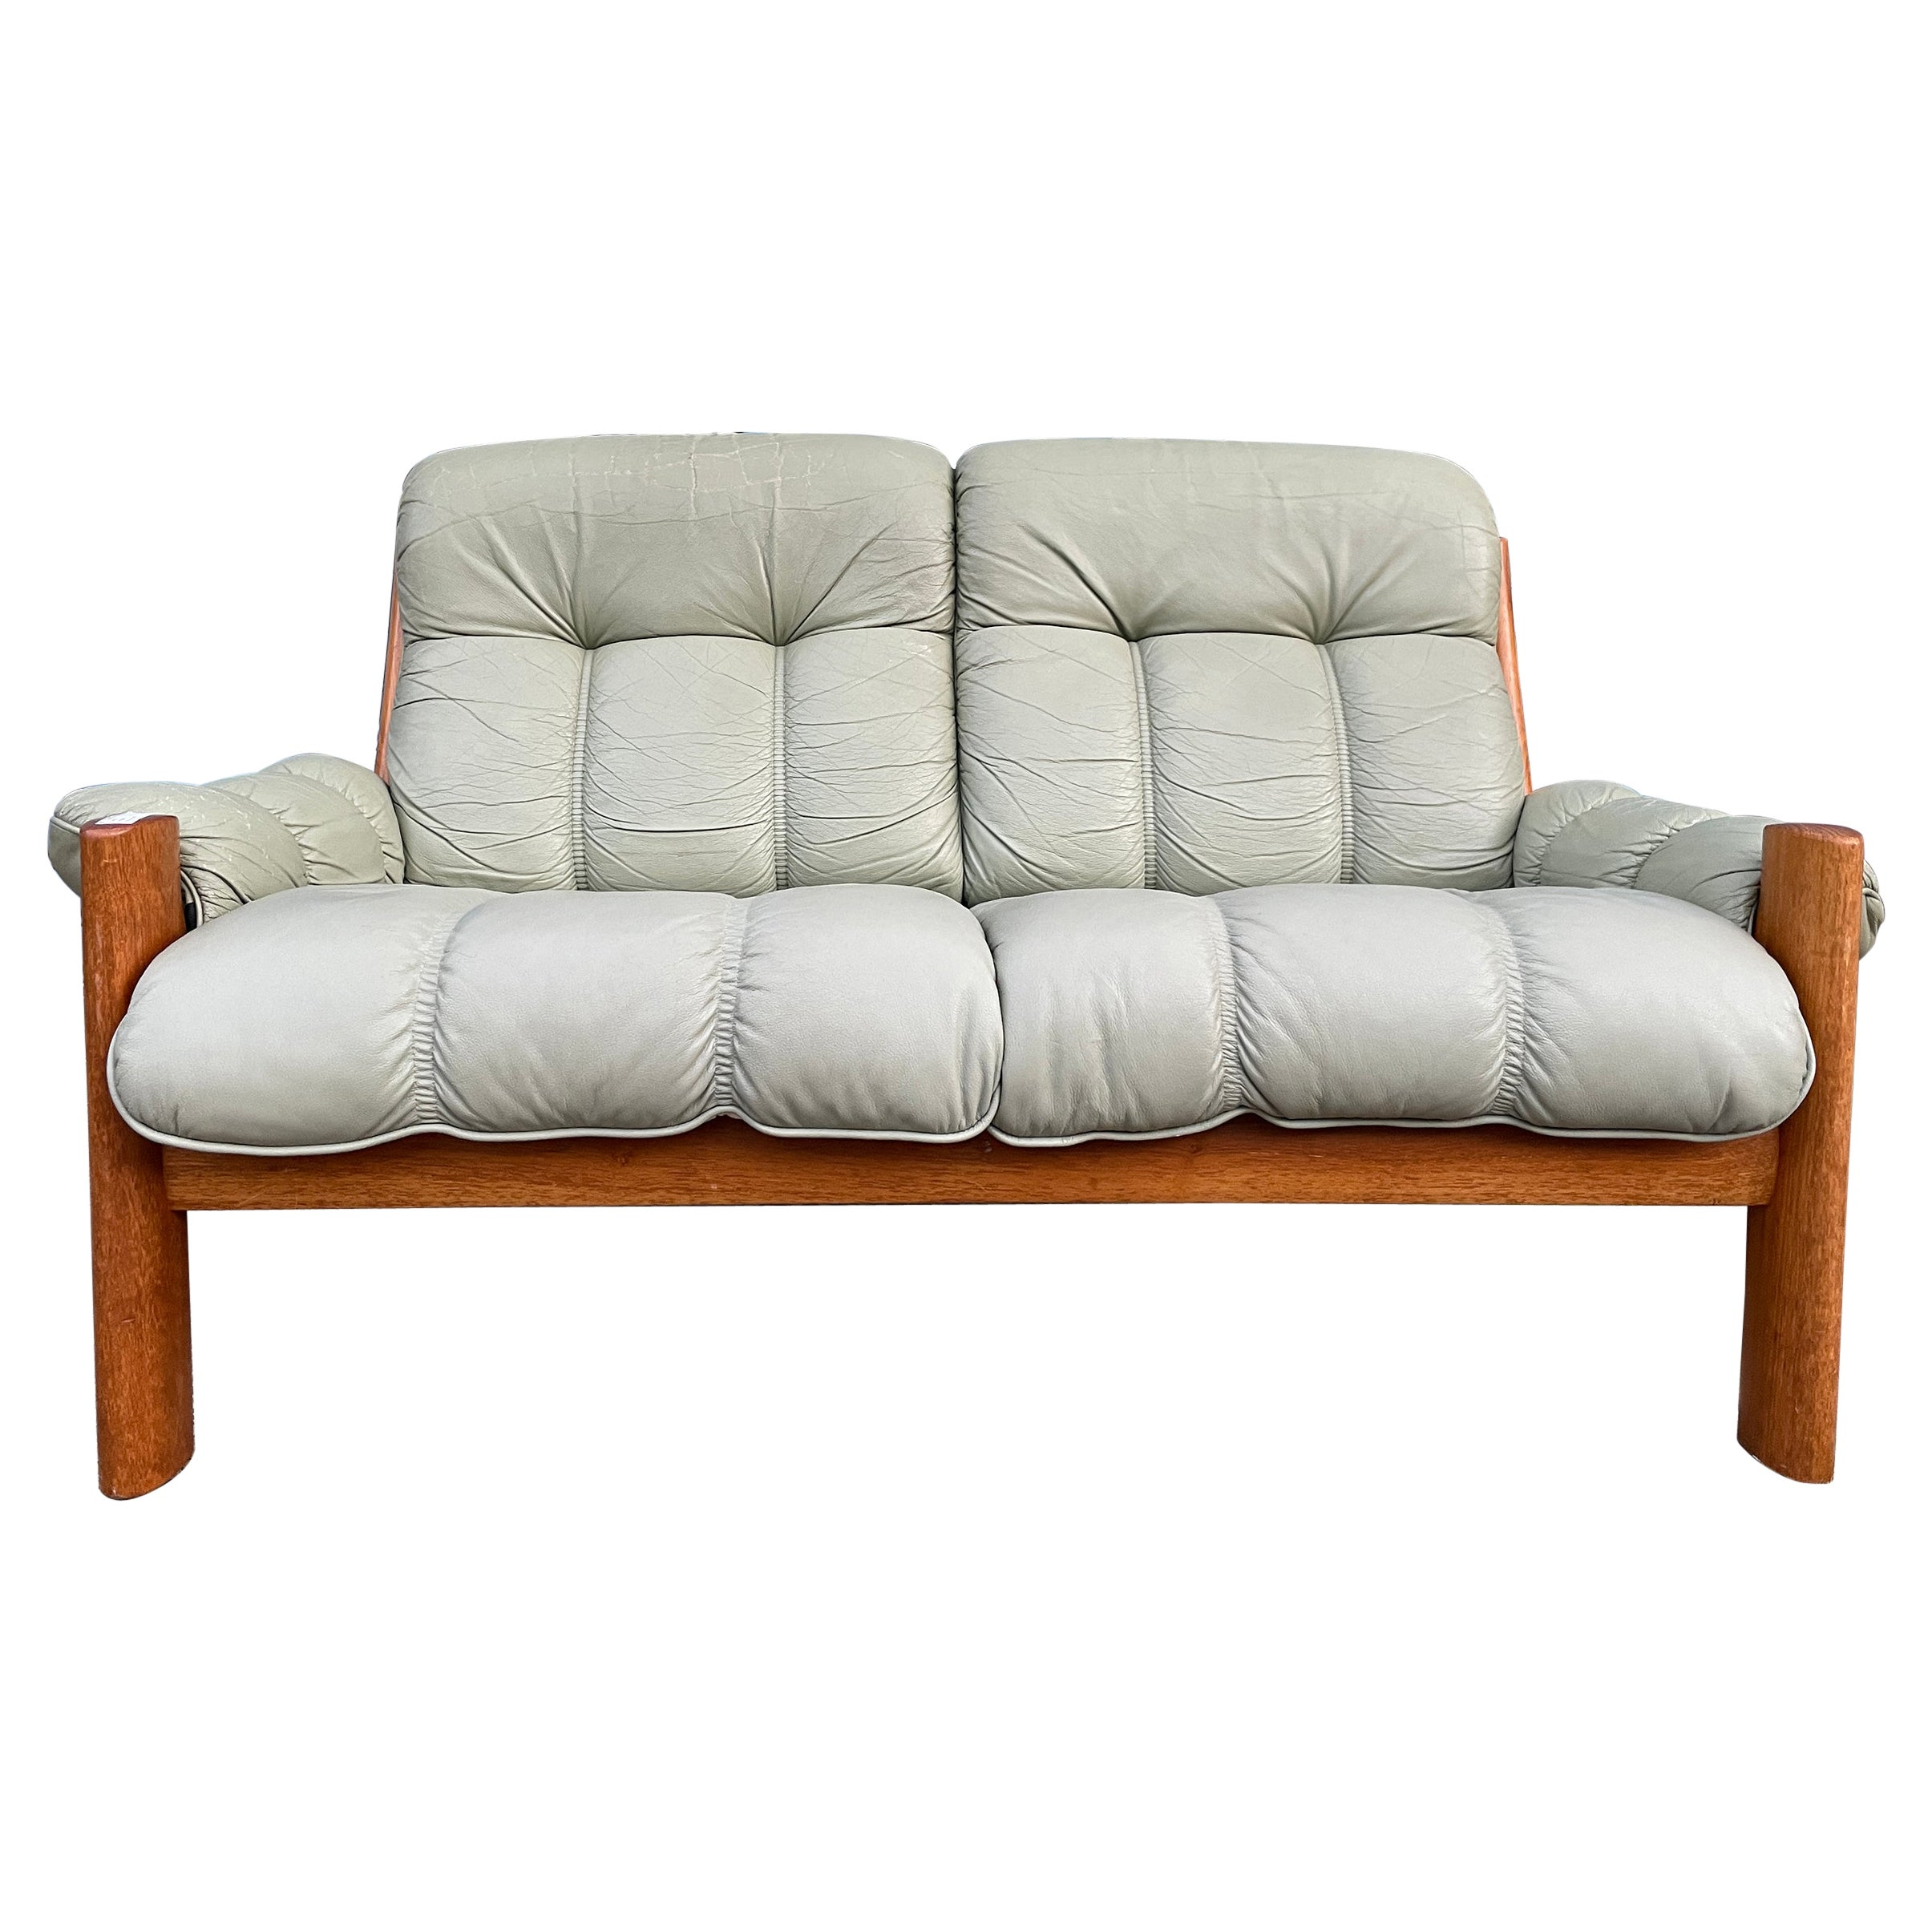 Midcentury Norwegian Modern Ekornes Leather Teak 2 Seater Sofa